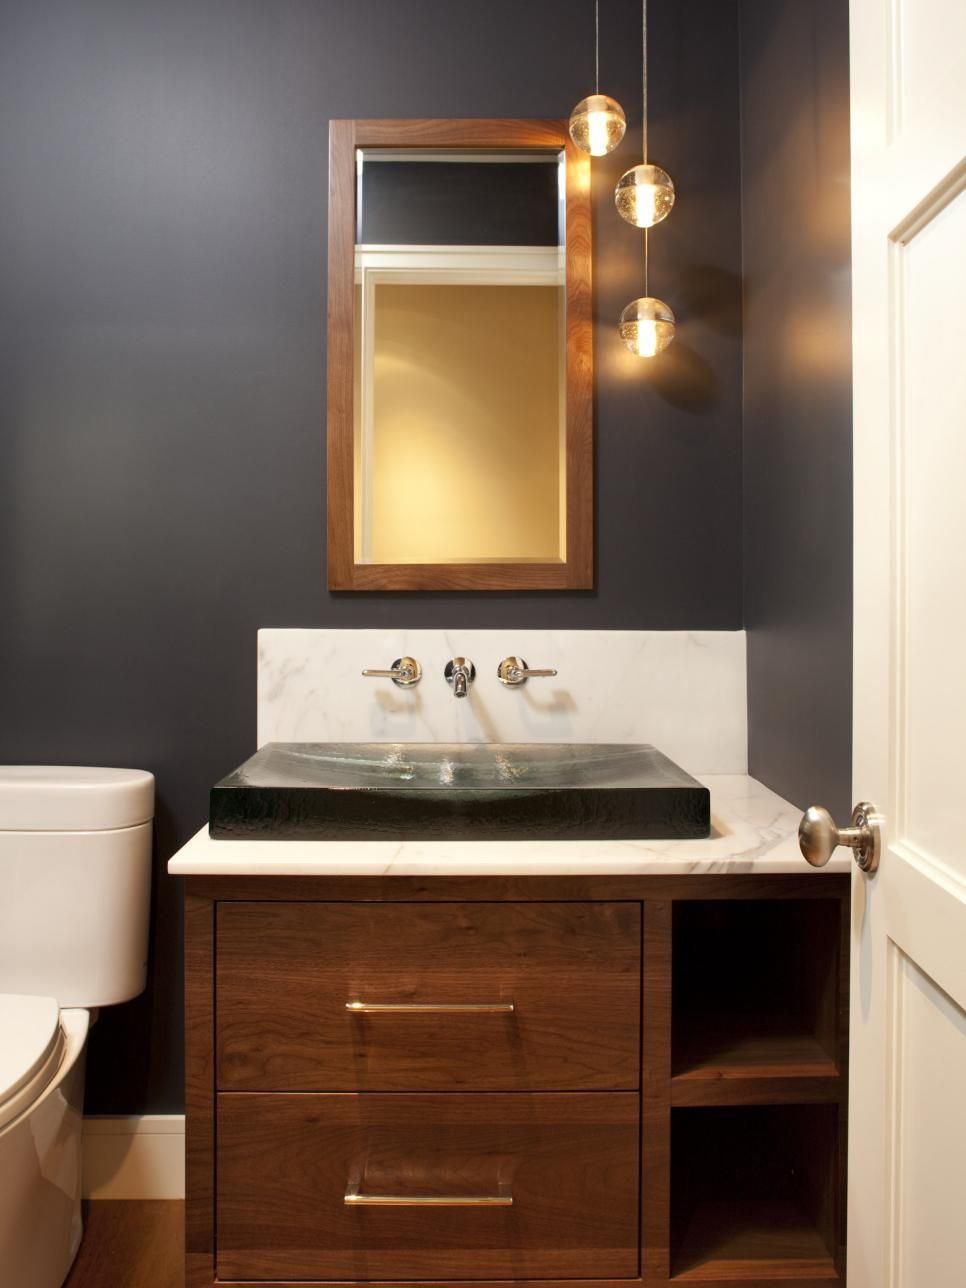 Illuminating Ideas for Beautiful Bathroom Lighting | Powder room ...